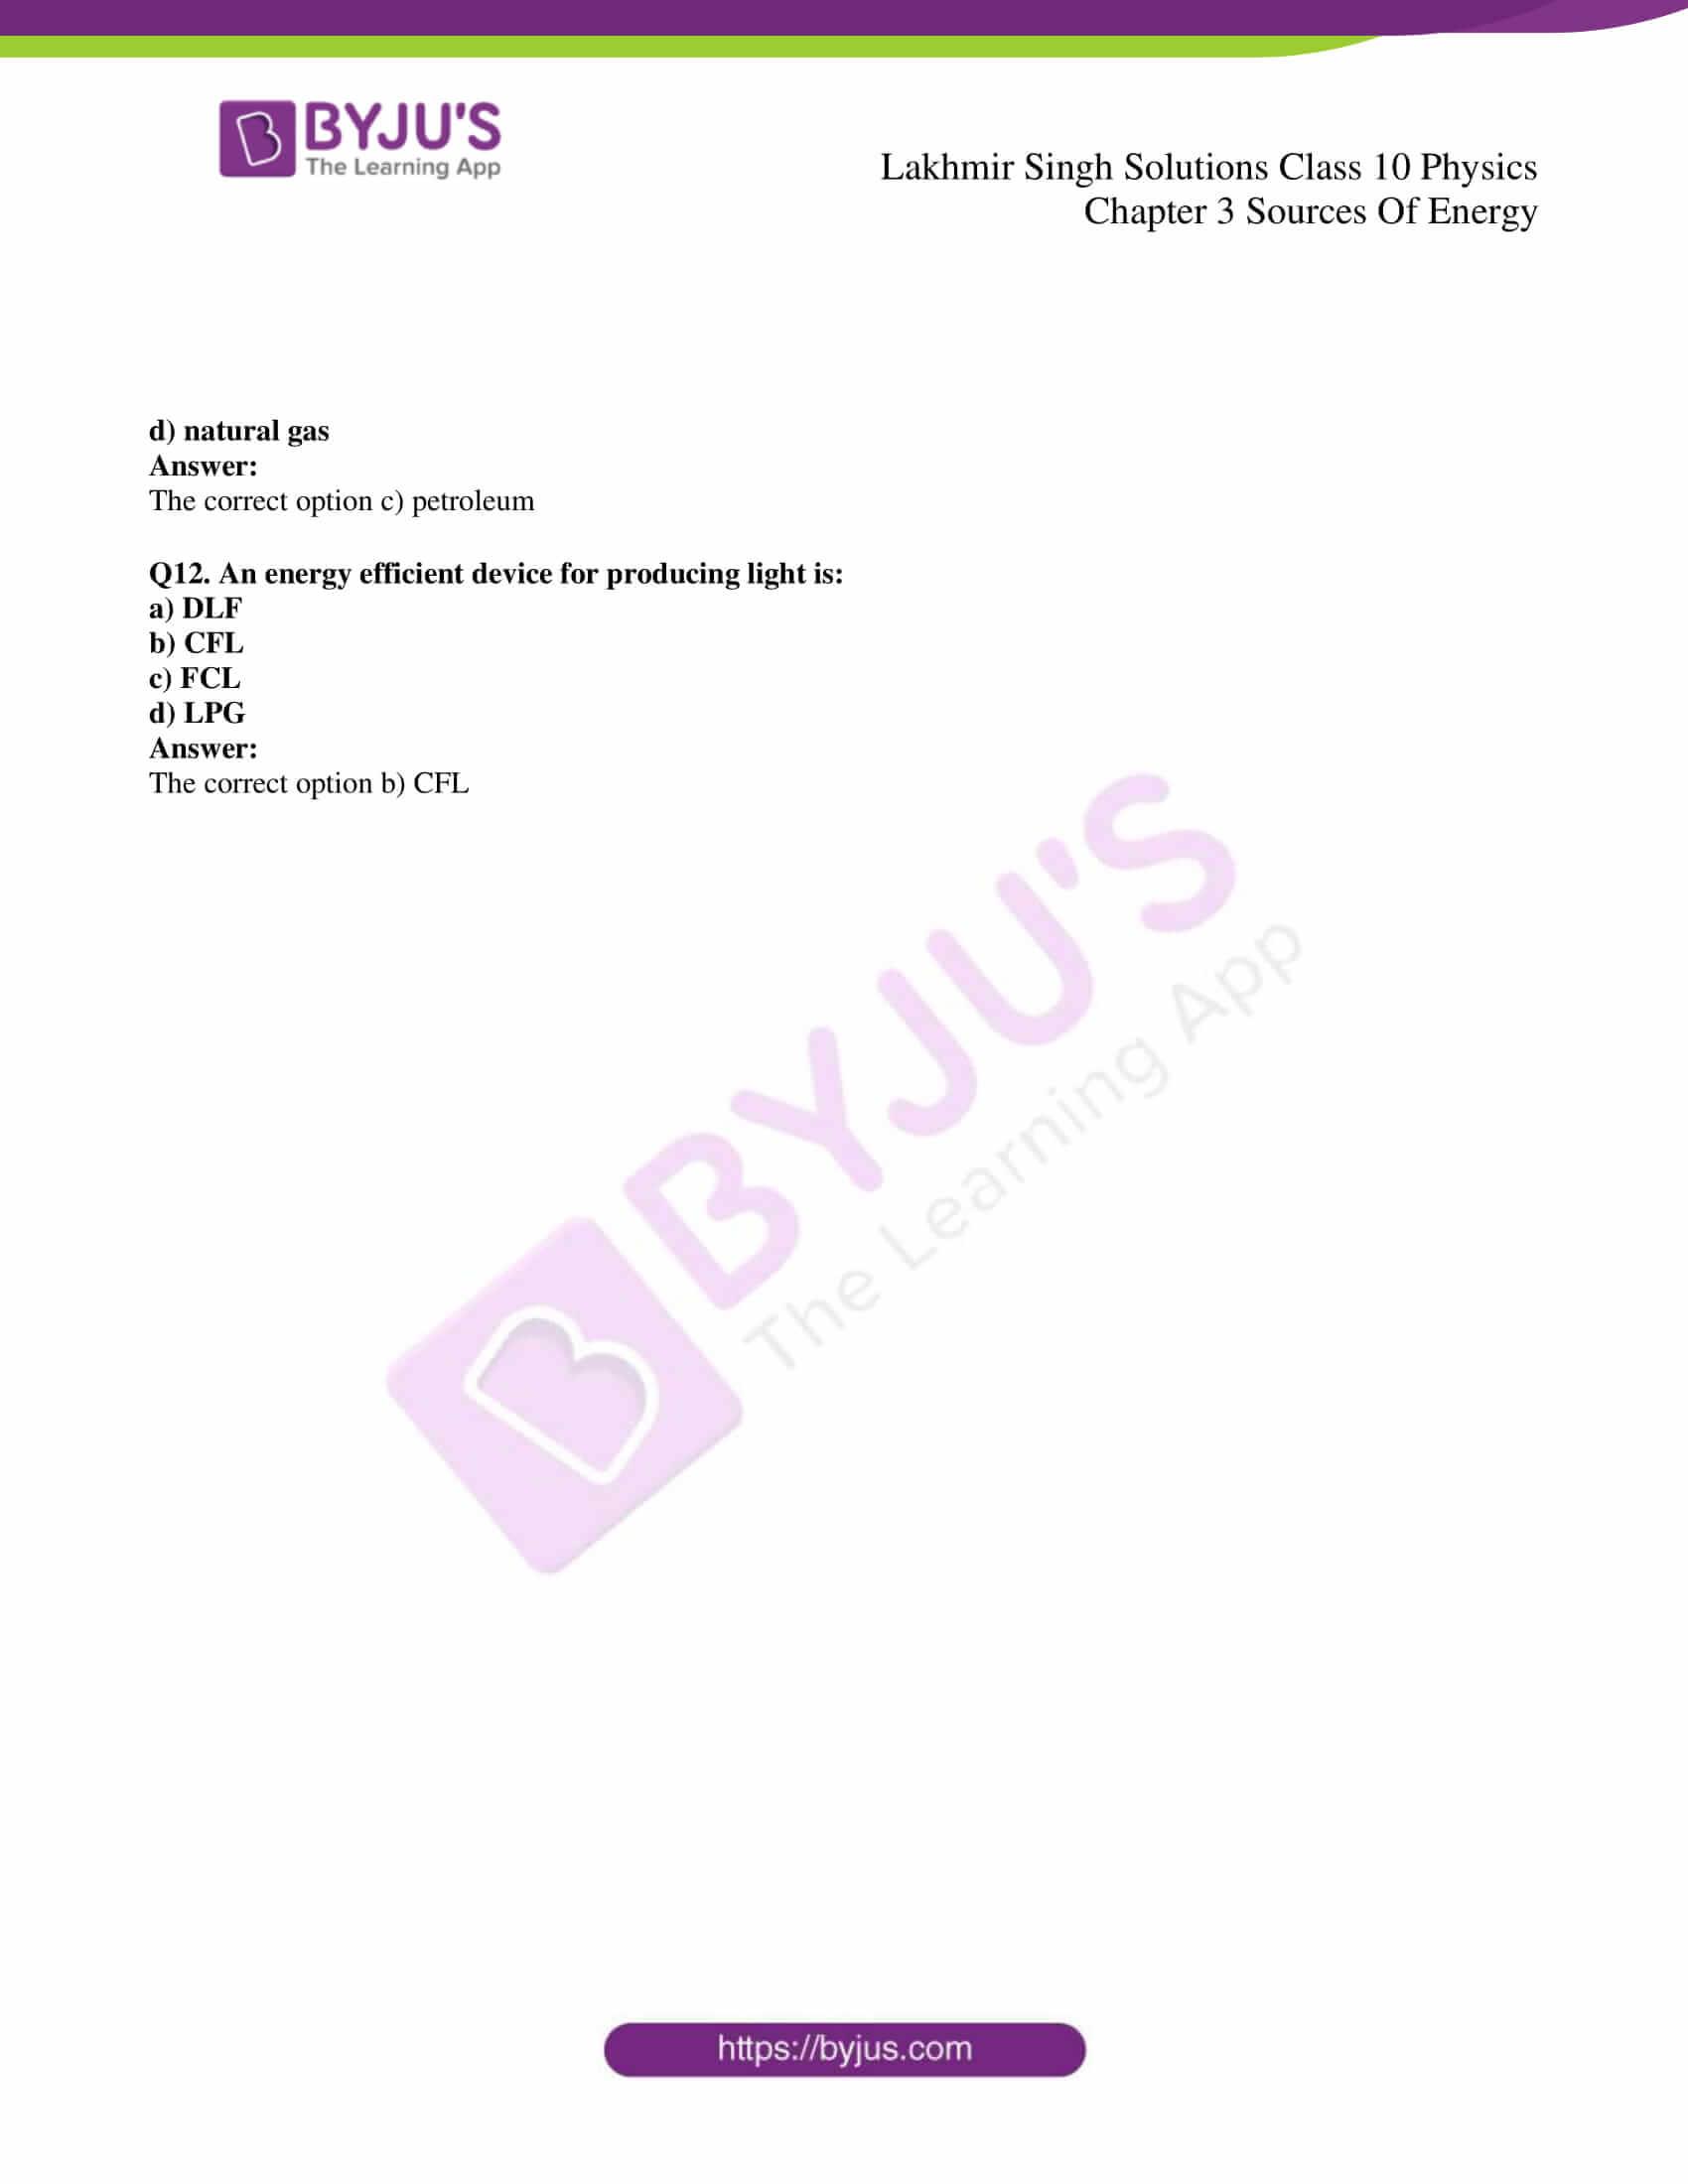 lakhmir singh sol class 10 physics chapter 3 21